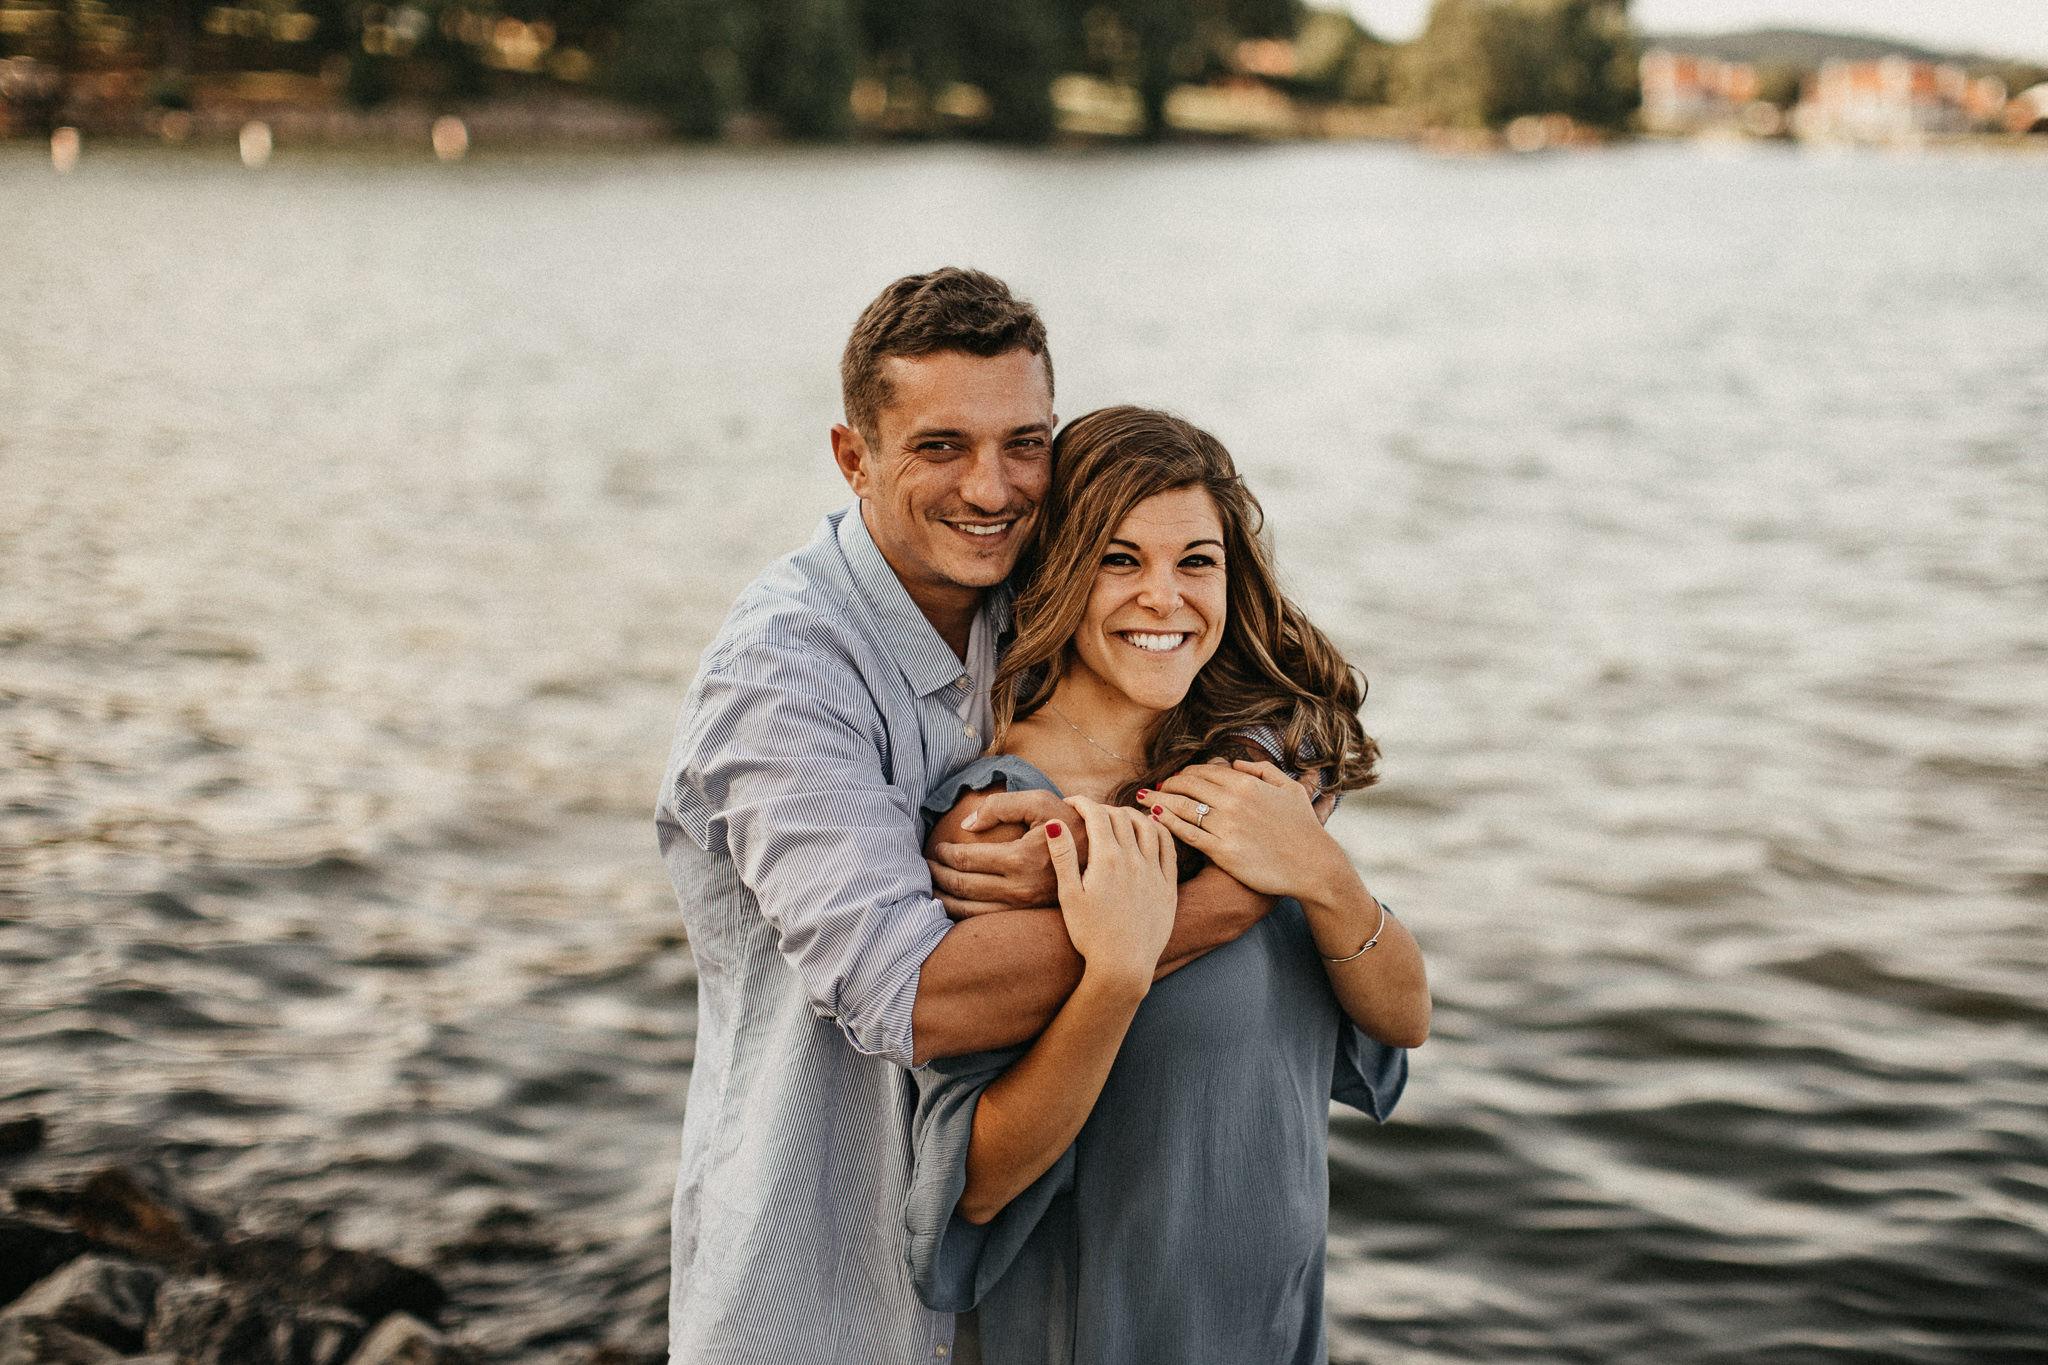 Claytor Lake State Park - Engagement portraits - Virginia wedding photographer - Pat Cori Photography-21.jpg